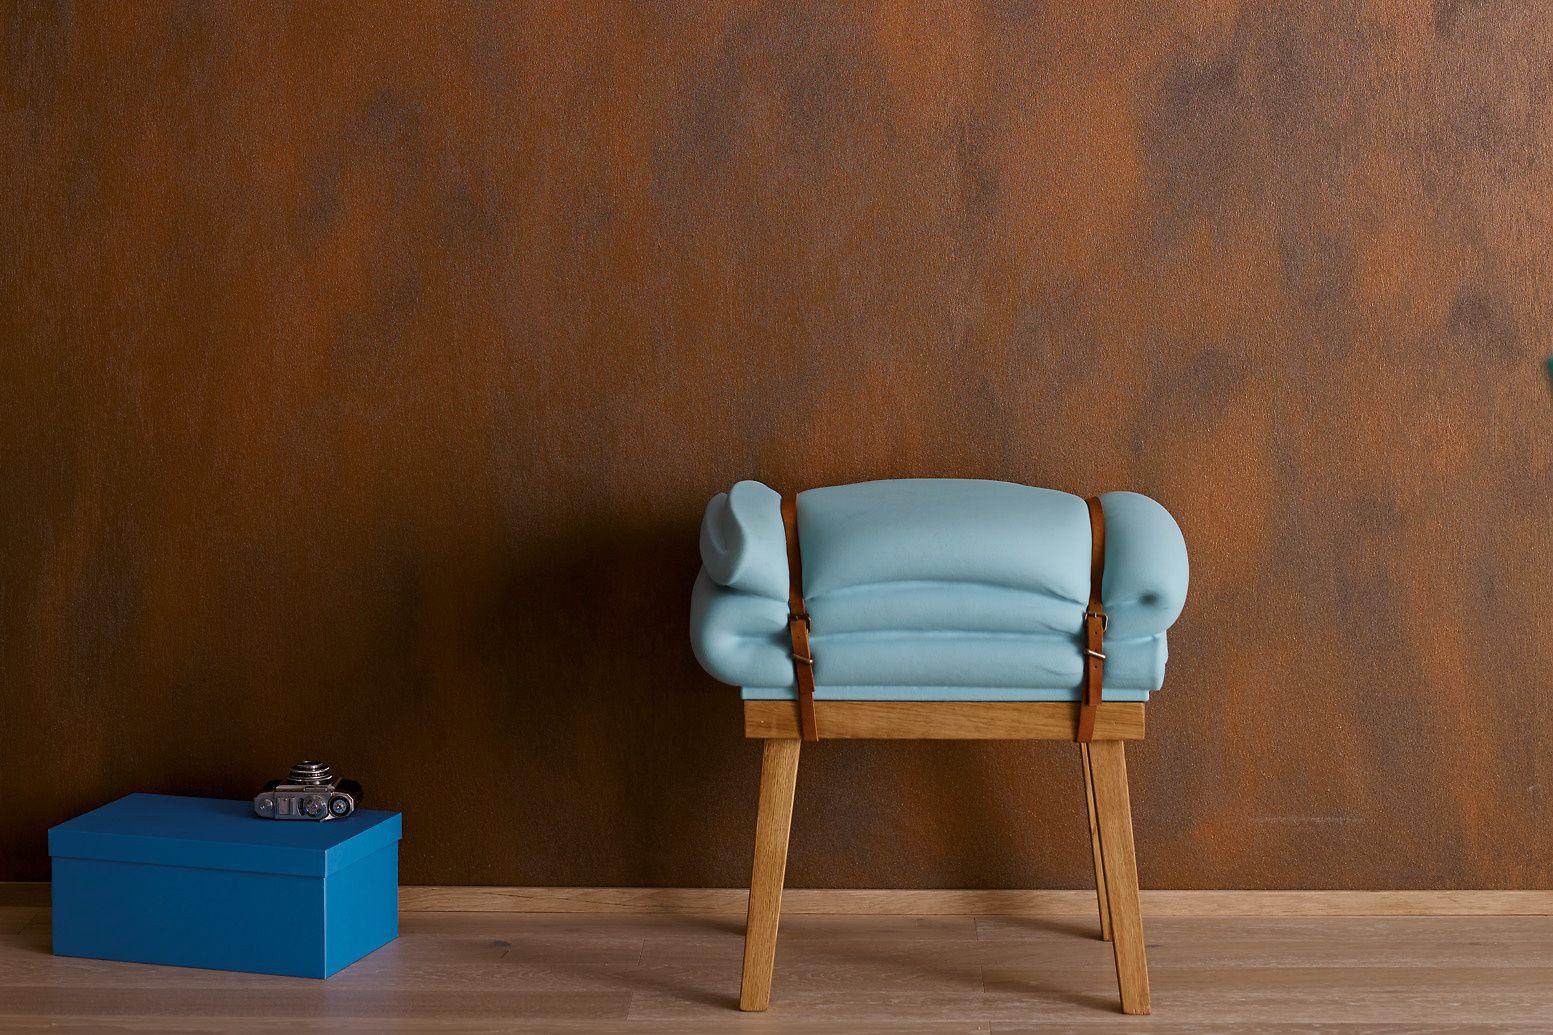 Wandfarbe Rost alpina farbrezepte rost optik wandfarbe ideen für s haus